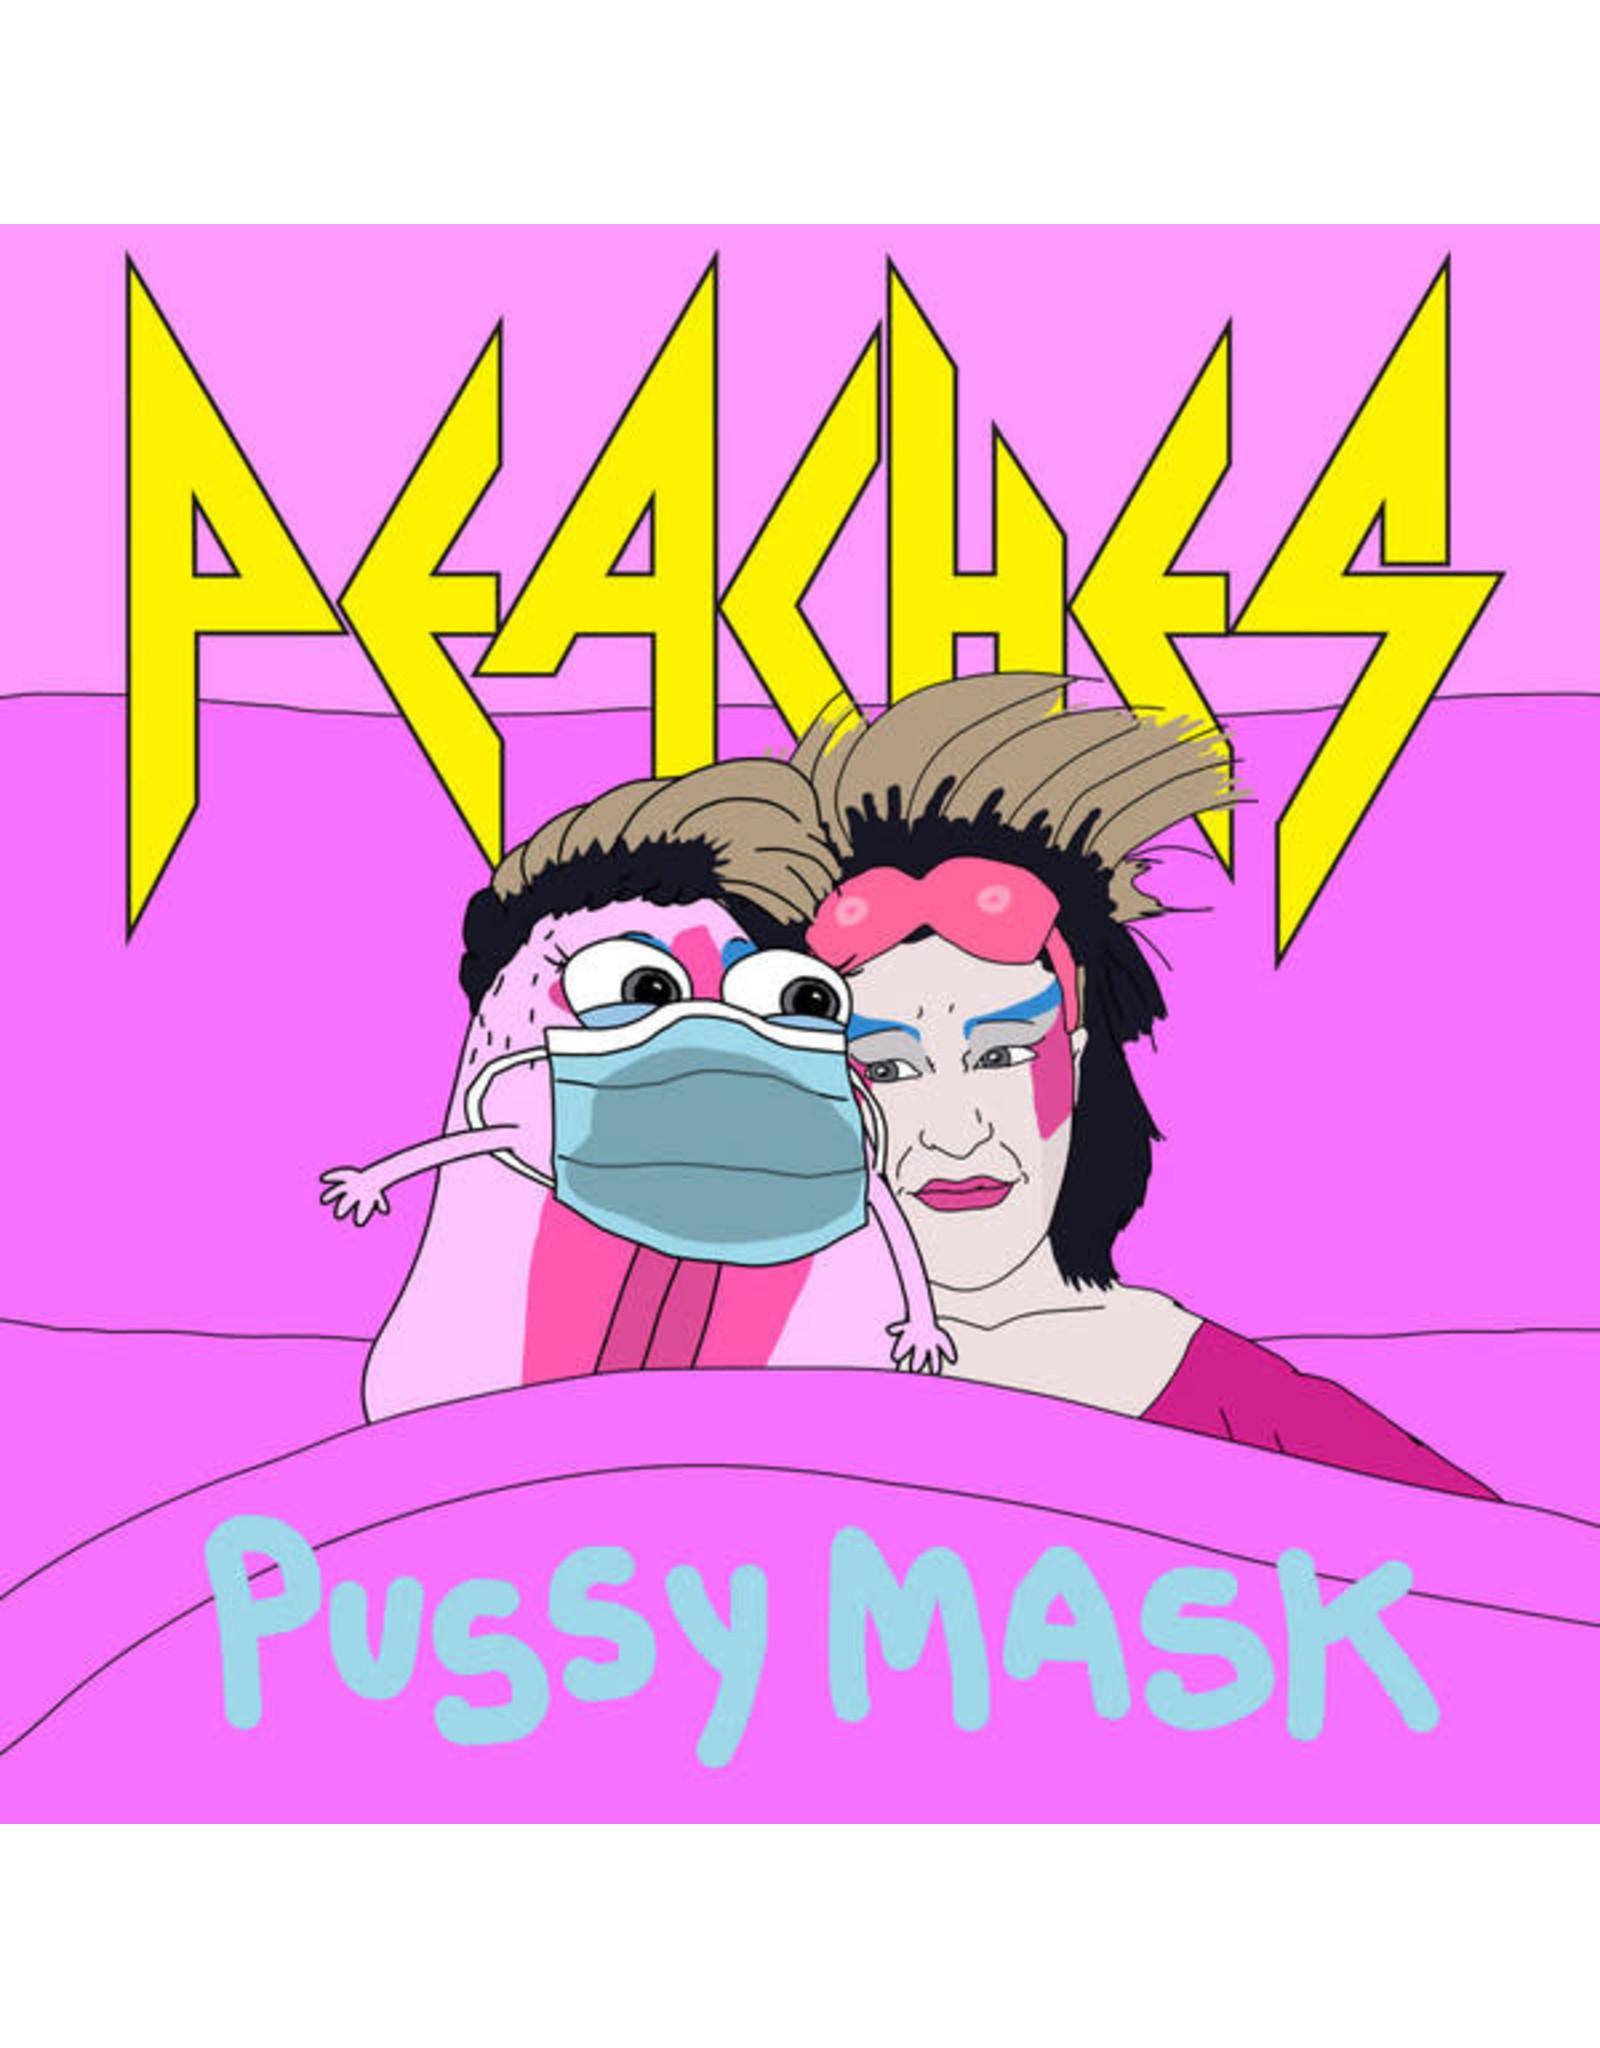 "New Vinyl Peaches - Pussy Mask 7"""